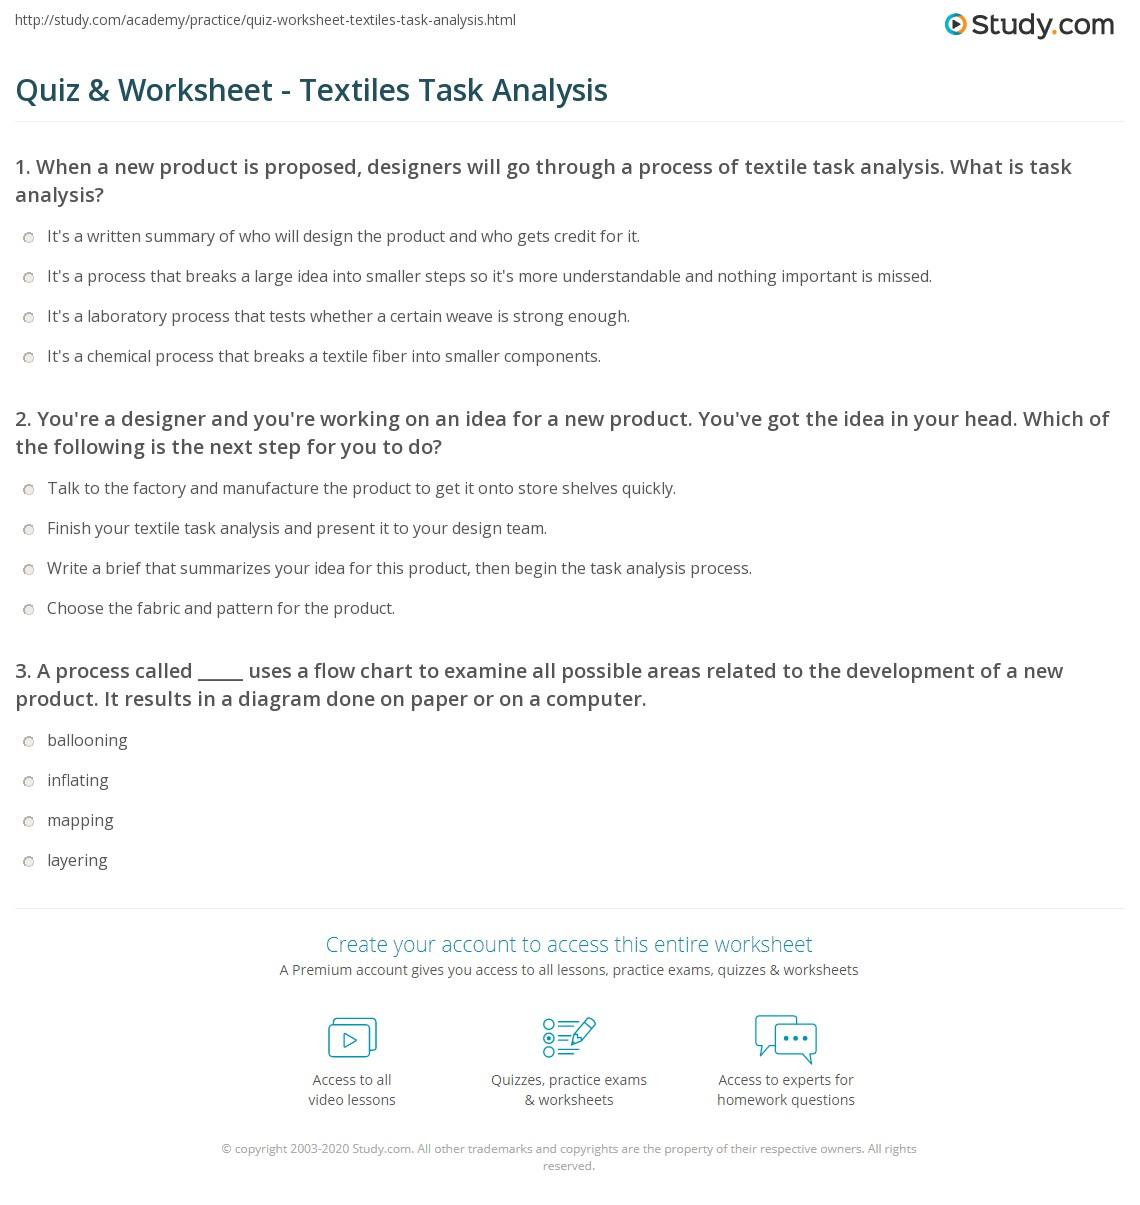 quiz worksheet textiles task analysis. Black Bedroom Furniture Sets. Home Design Ideas